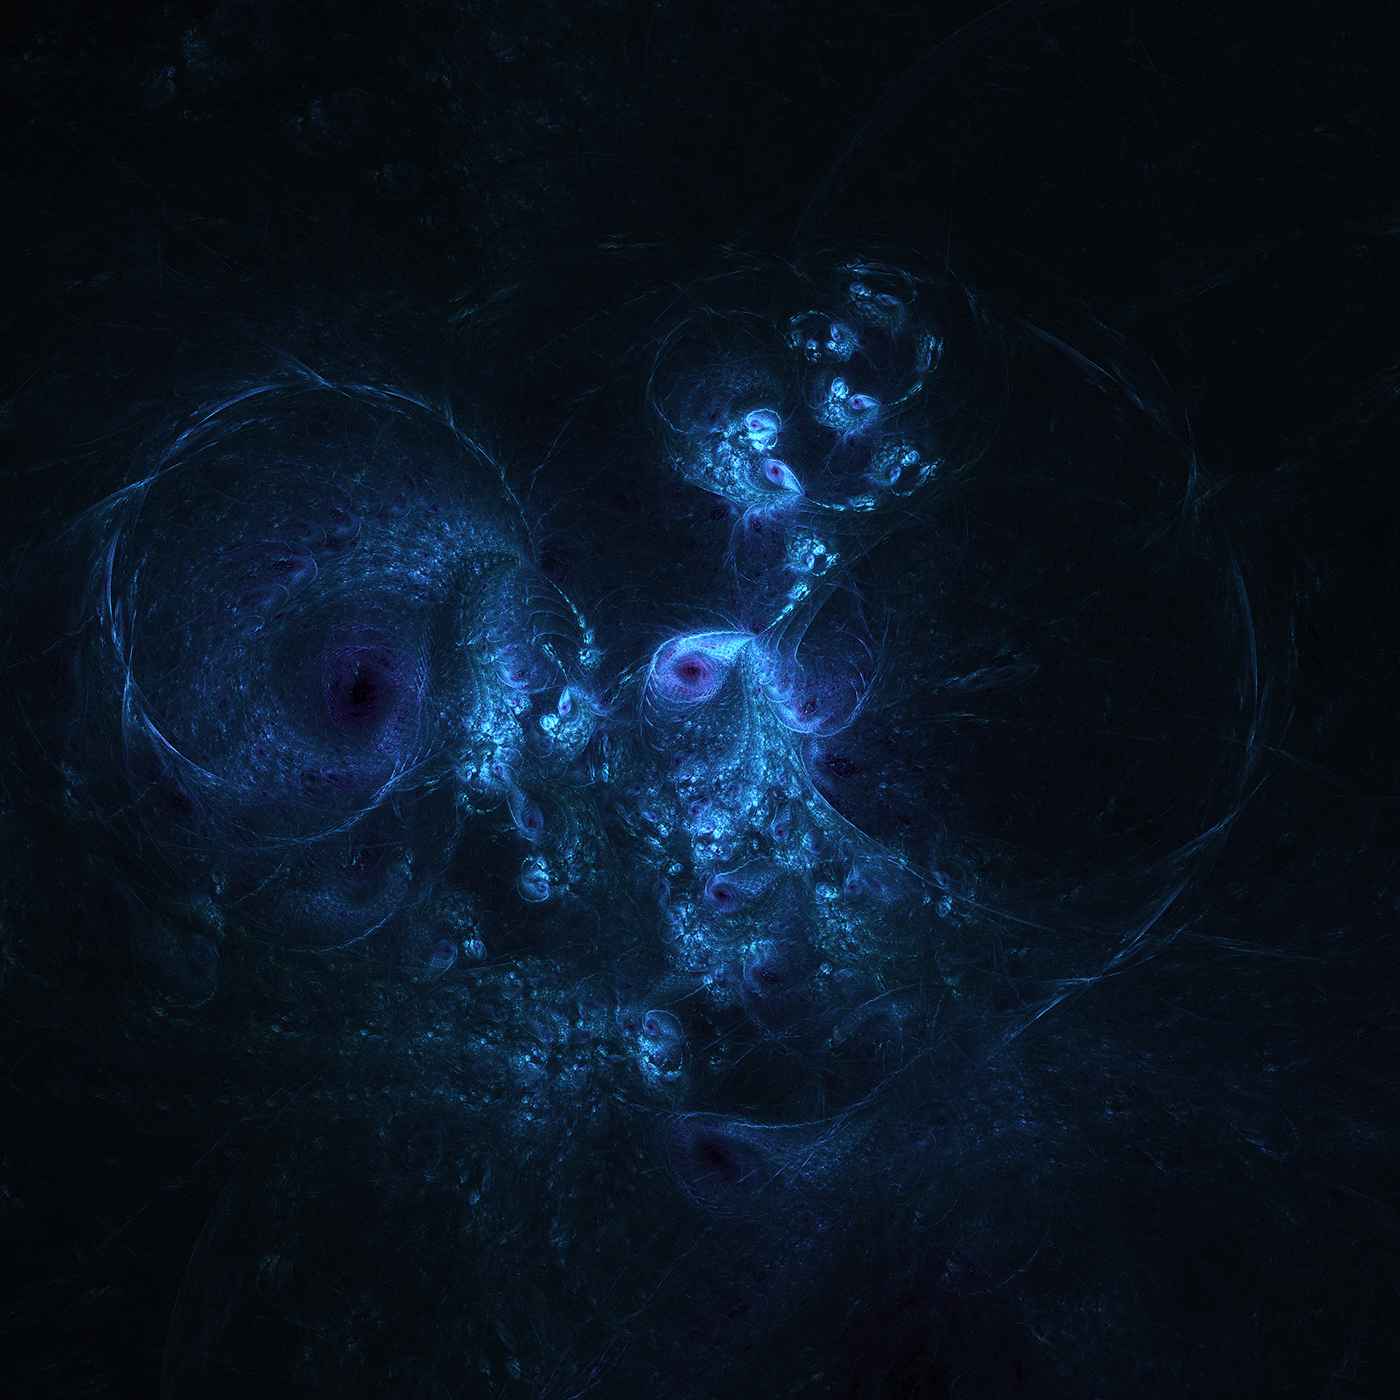 fractal,chaos,random,mandelbrot,chaotica,maths,simulations,annihilation